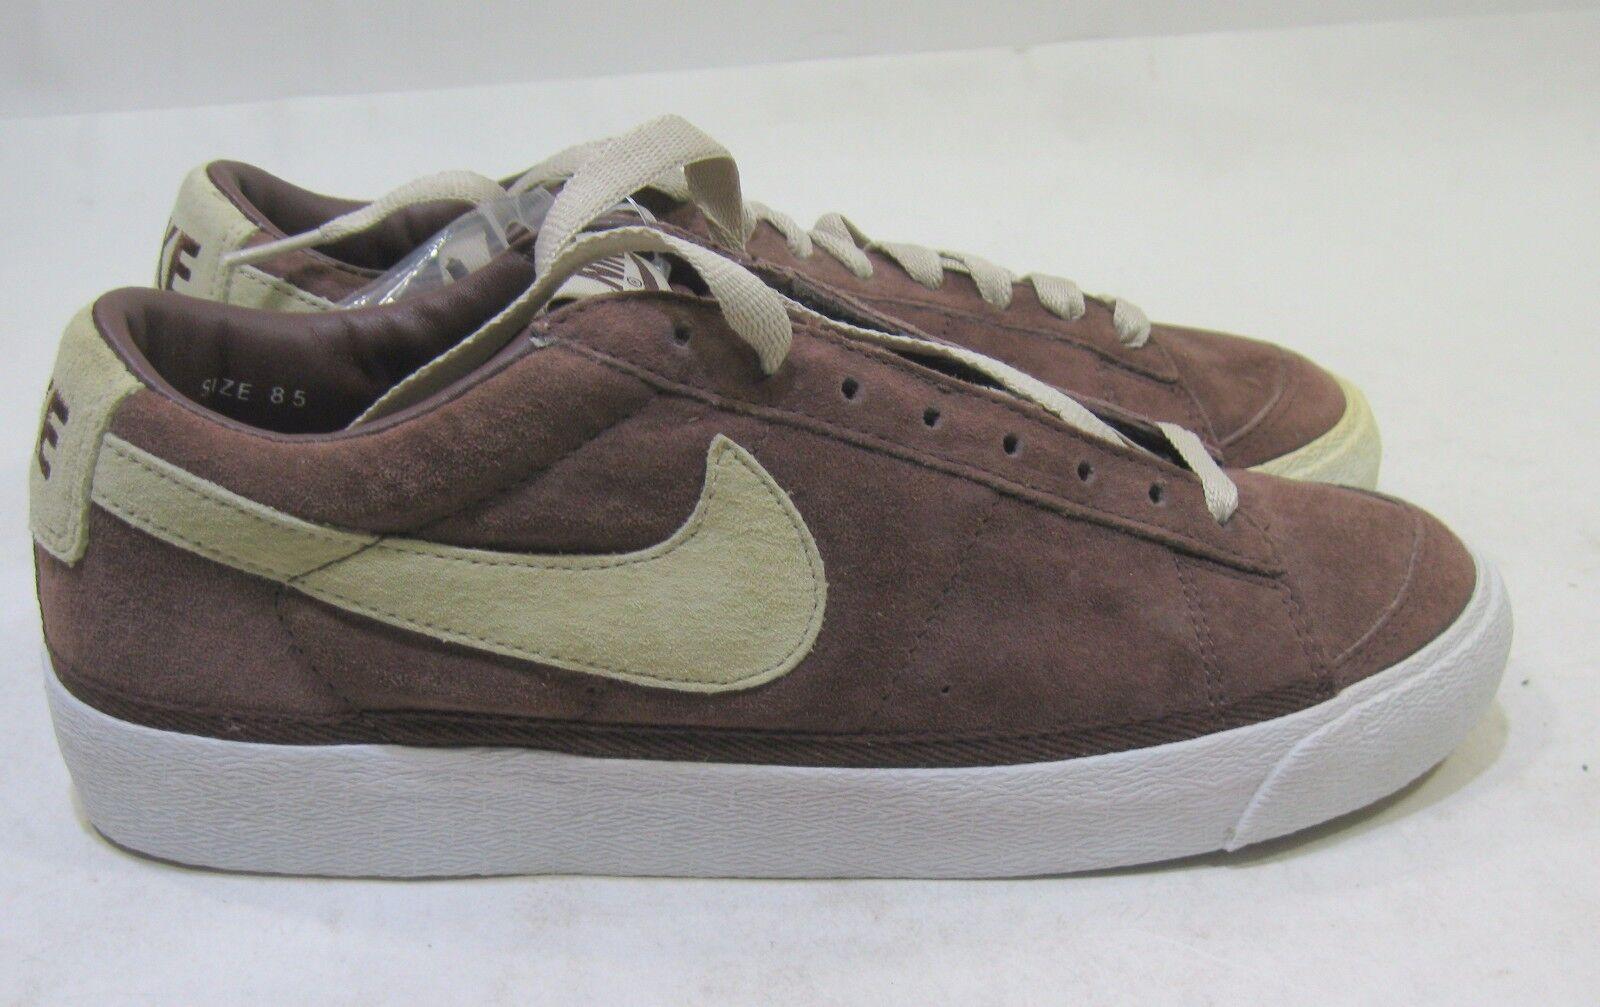 Nike Blazer Suede (Team Brown/Net/White) - Shoes - 305415-211 Size 8.5